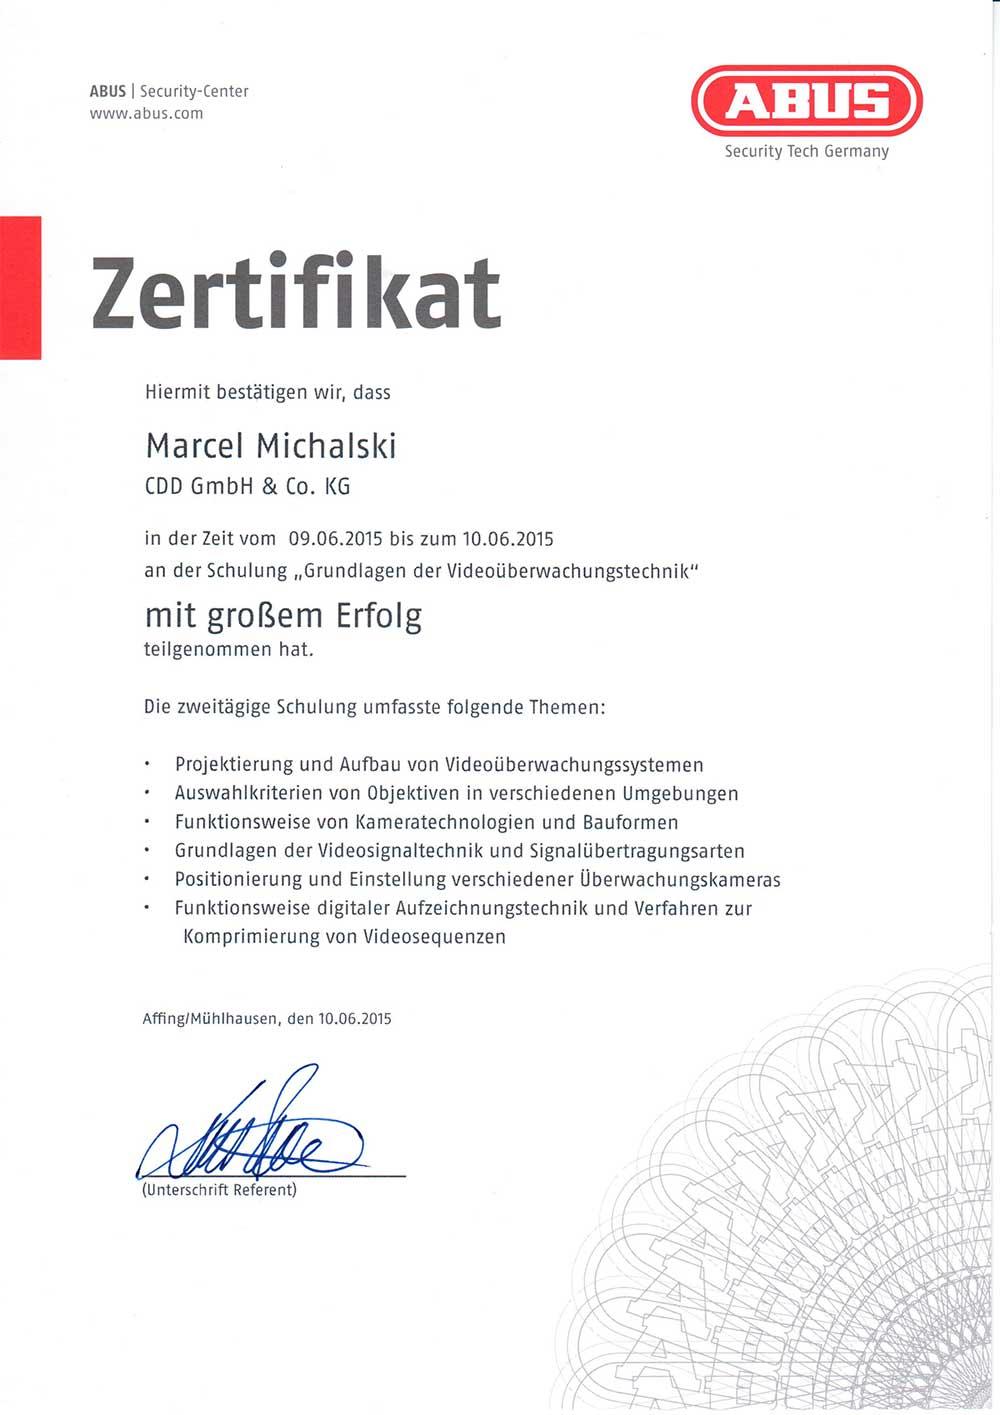 Marcel Michalski Zertifikat ABUS